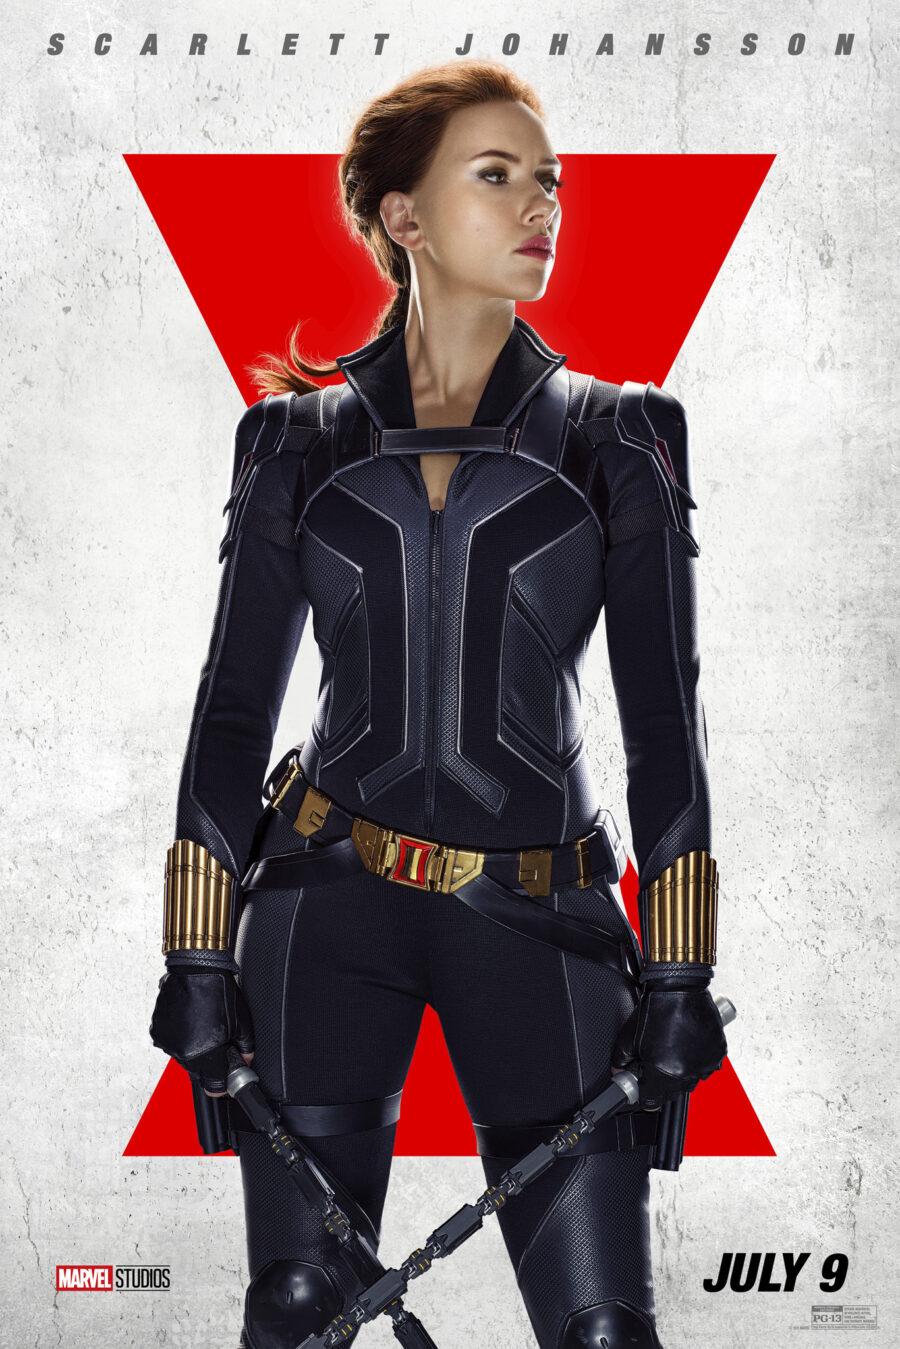 Scarlett Johansson black widow poster